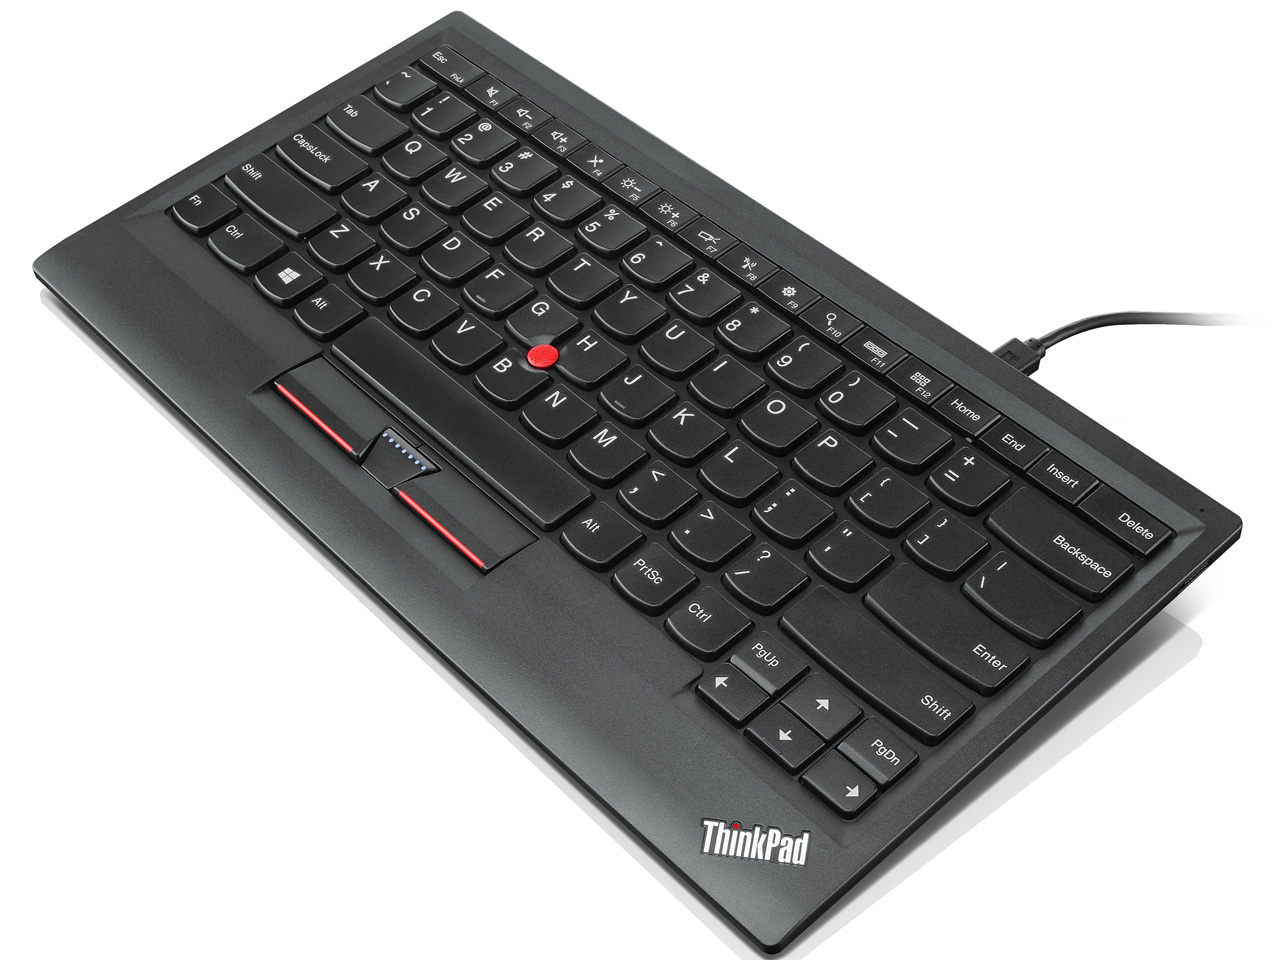 Lenovo ThinkPad トラックポイント・キーボード 英語配列 0B47190